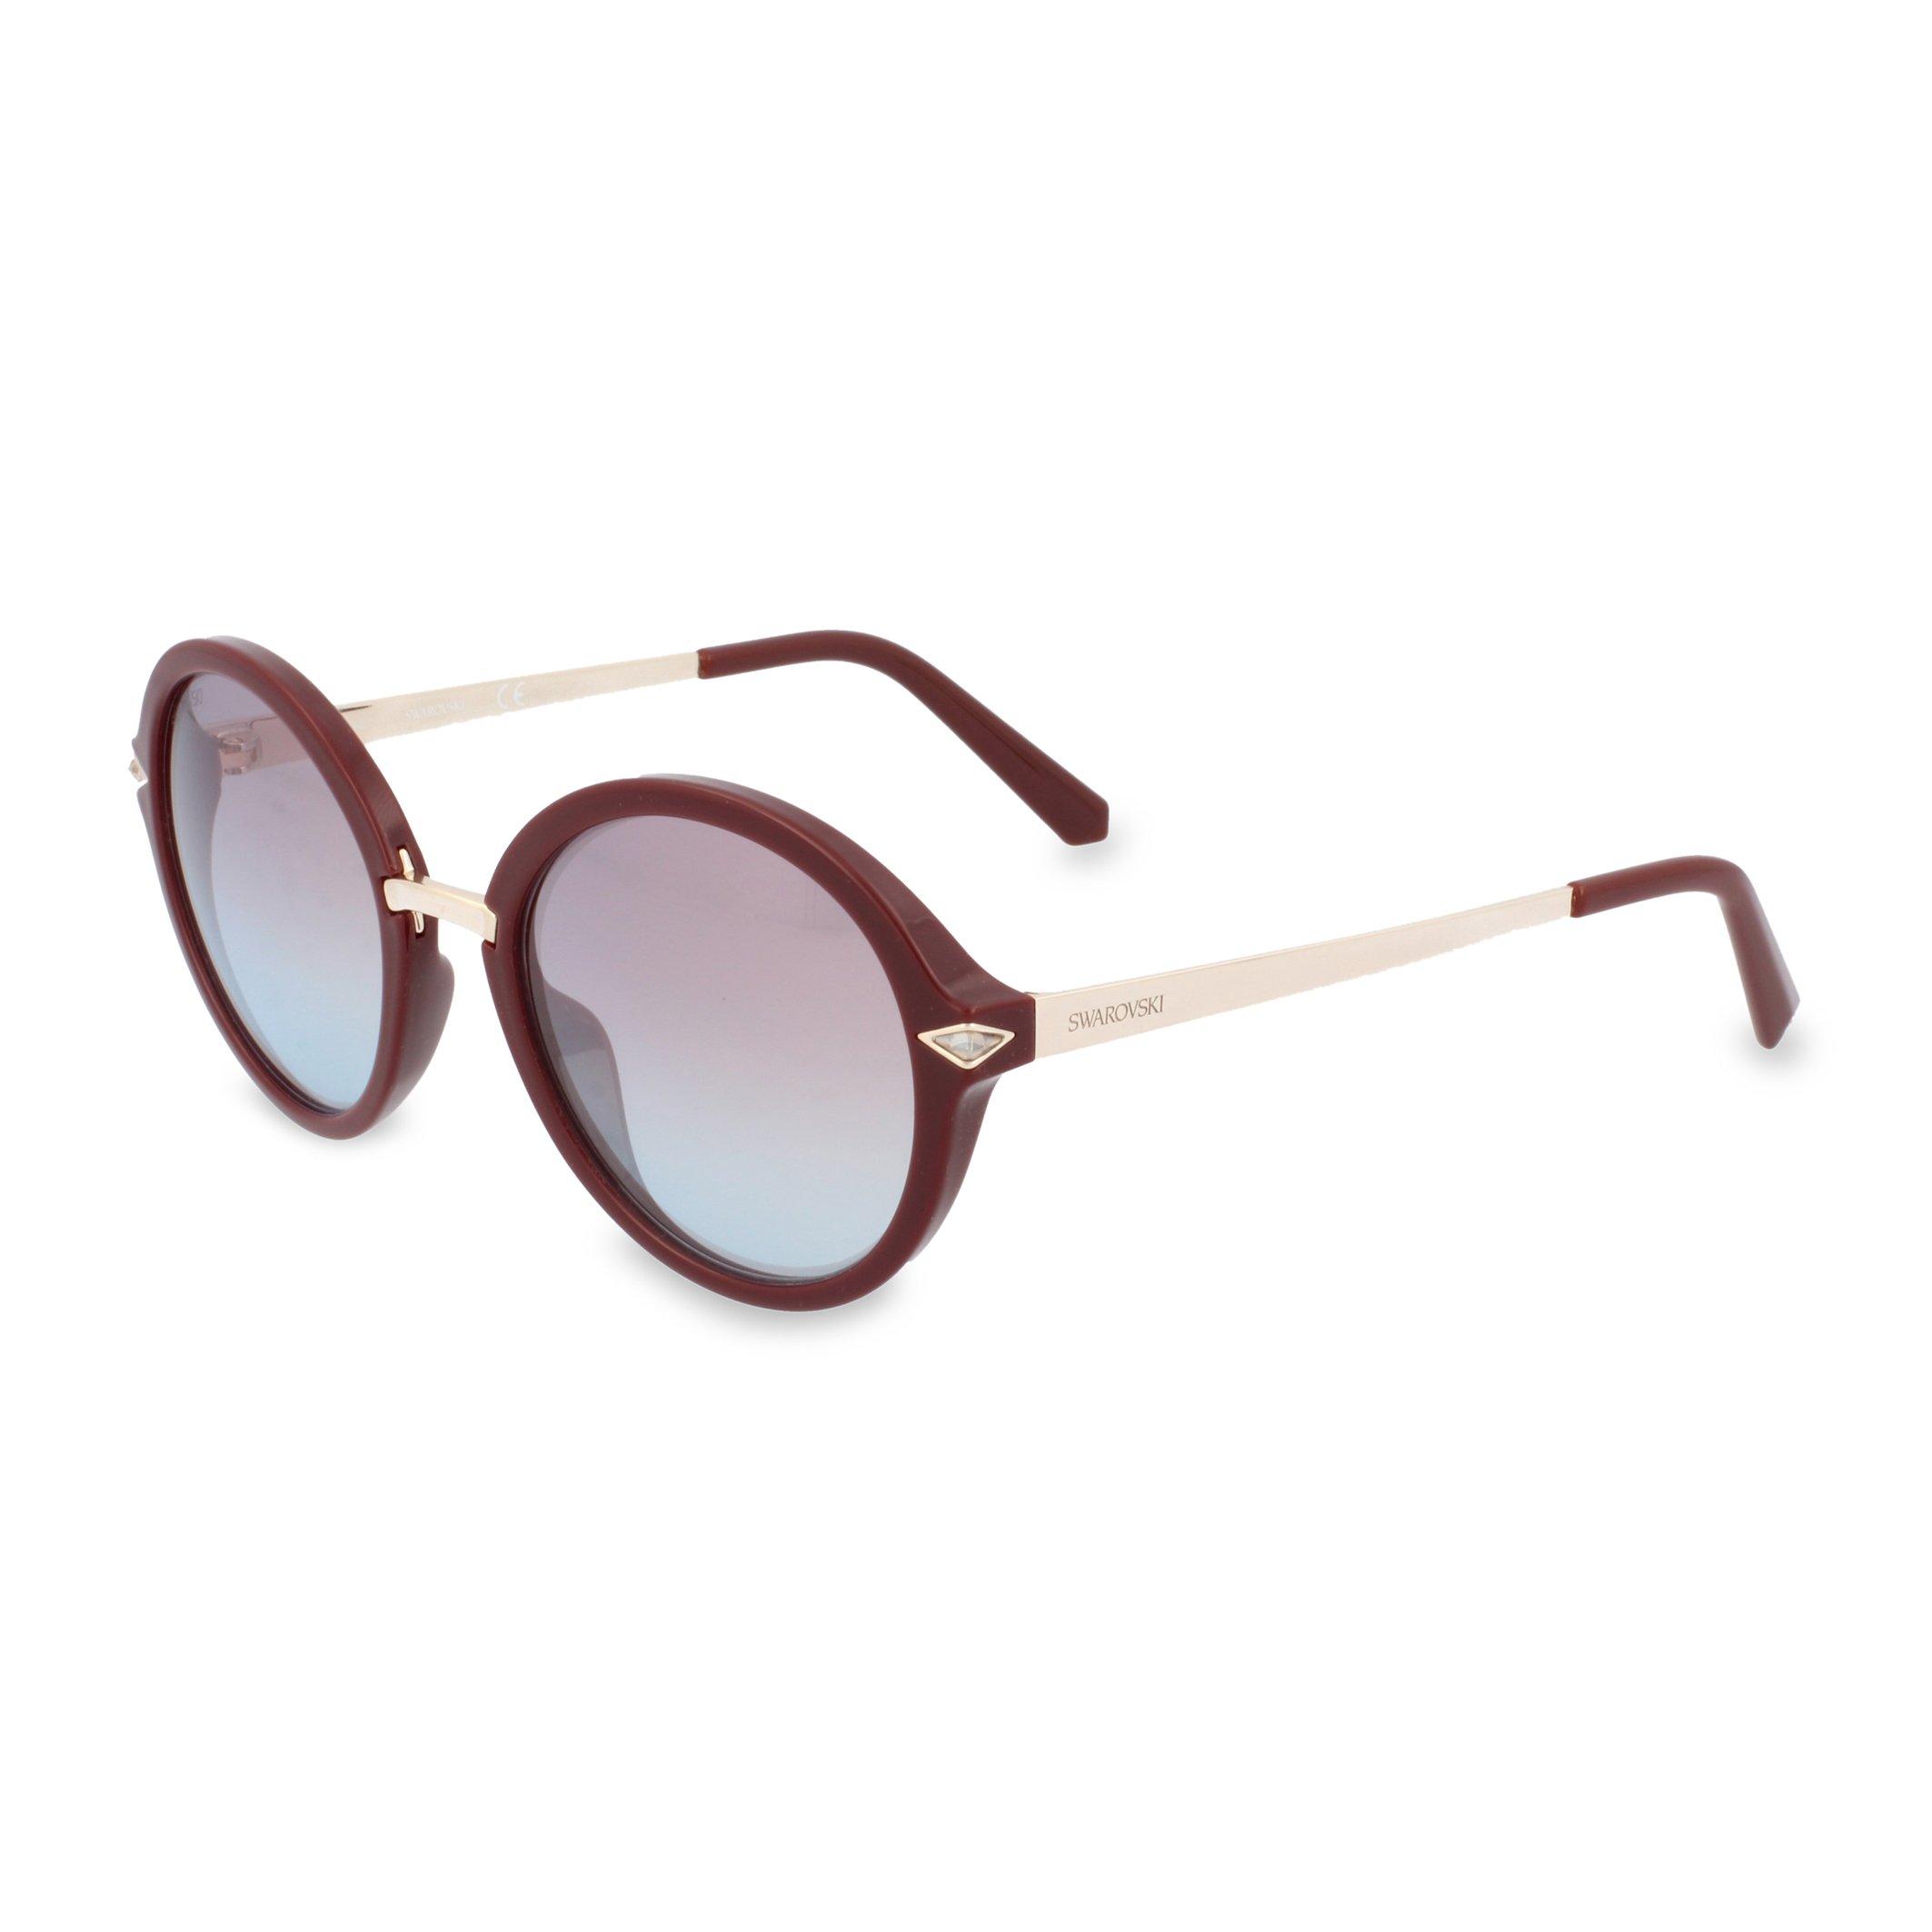 Swarovski Women's Sunglasses Black SK0153 - brown NOSIZE